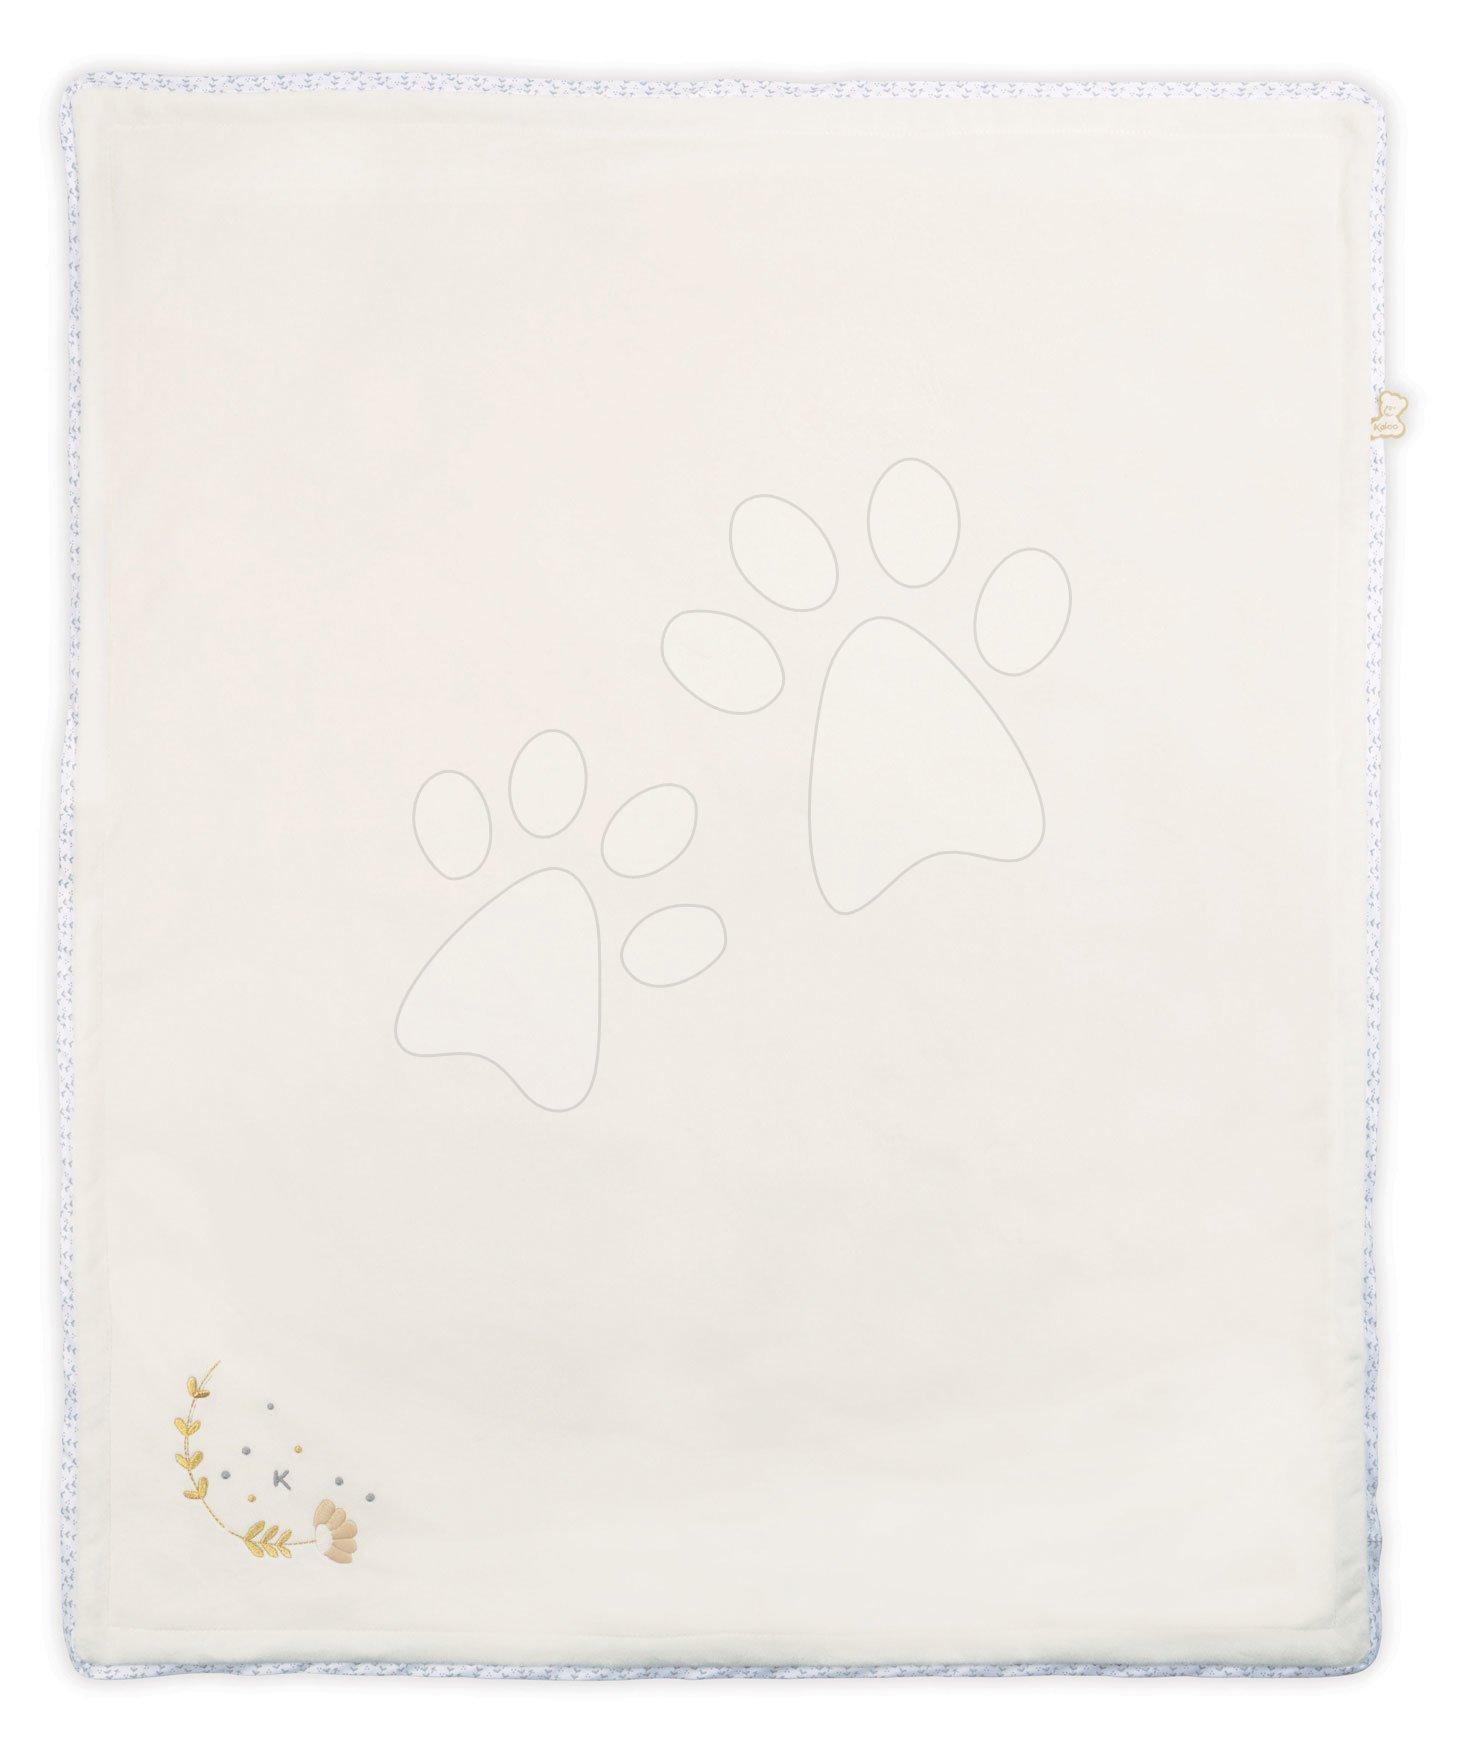 Deka pre najmenších My Super Soft Blanket Perle Kaloo biela 85*70 cm z mäkkého materiálu s výšivkou od 0 mes